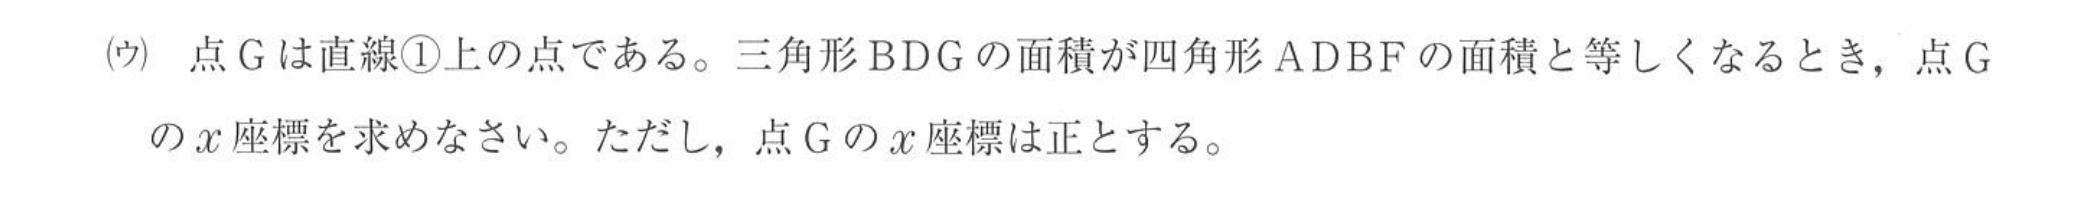 2019神奈川県公立高校入試、数学問4(ウ)